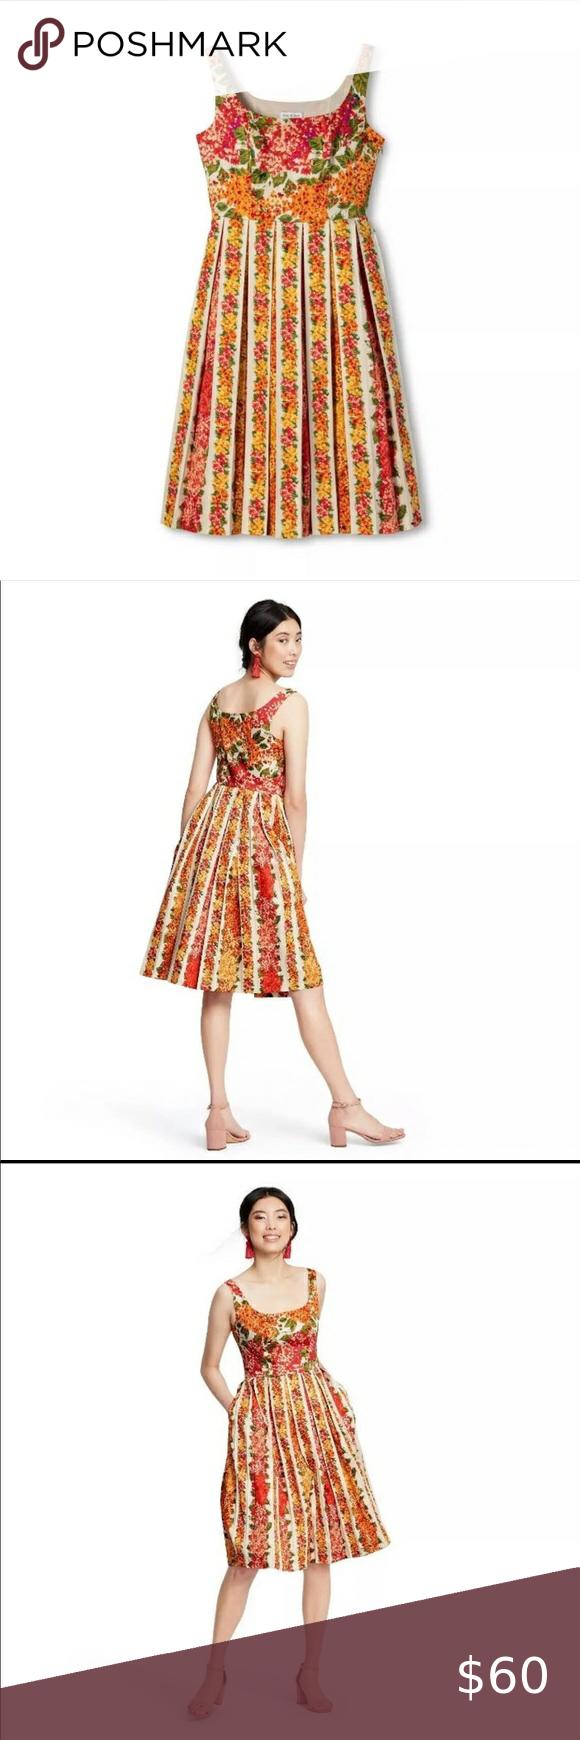 Isaac Mizrahi For Target Garden Party Orange Dress Orange Floral Dress Pleated Dress Target Womens Dresses [ 1740 x 580 Pixel ]